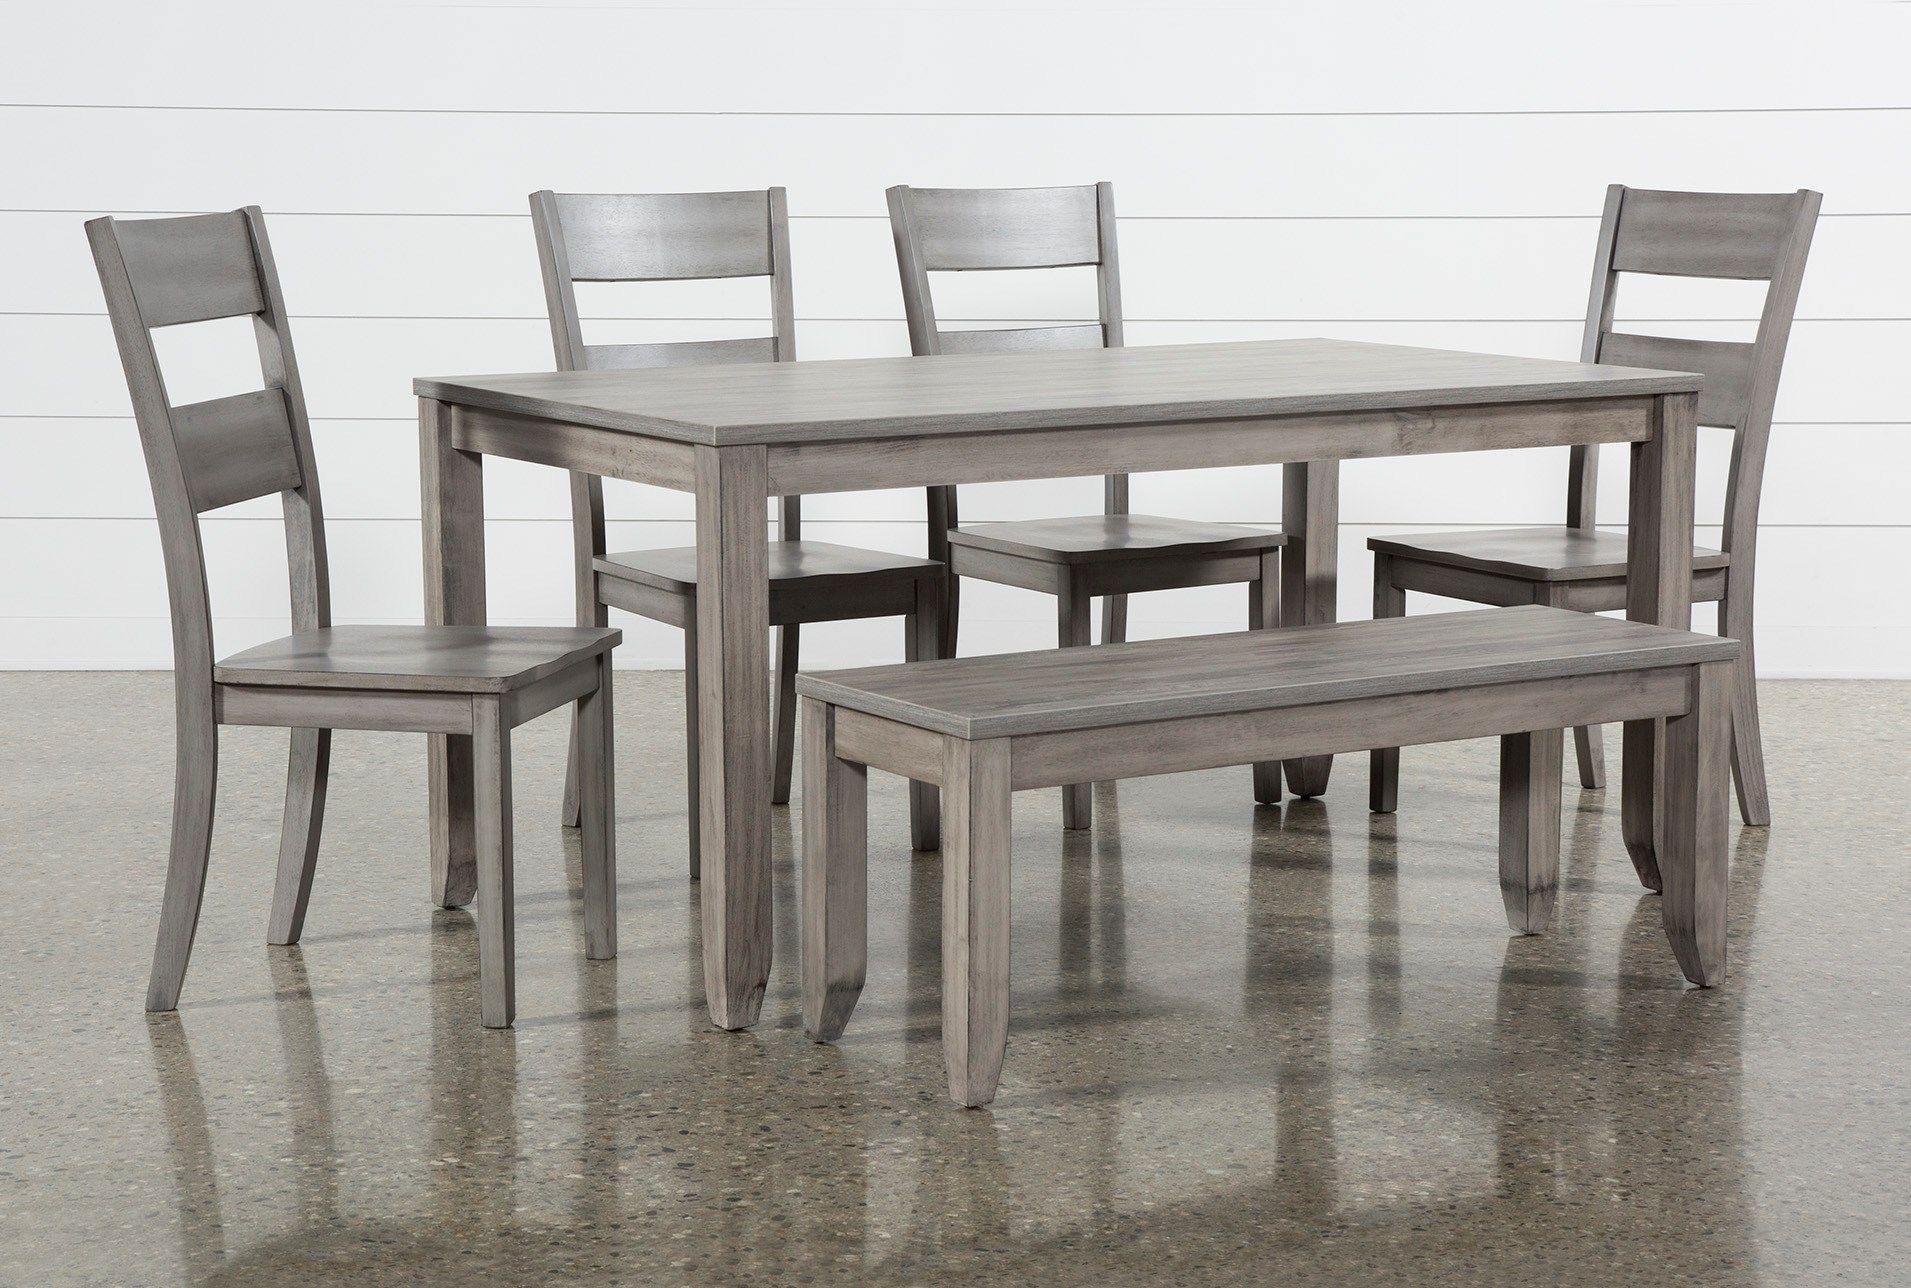 Matias Grey 6 Piece Dining Set Dining Room Sets Round Dining Table Sets Dining Room Table Set